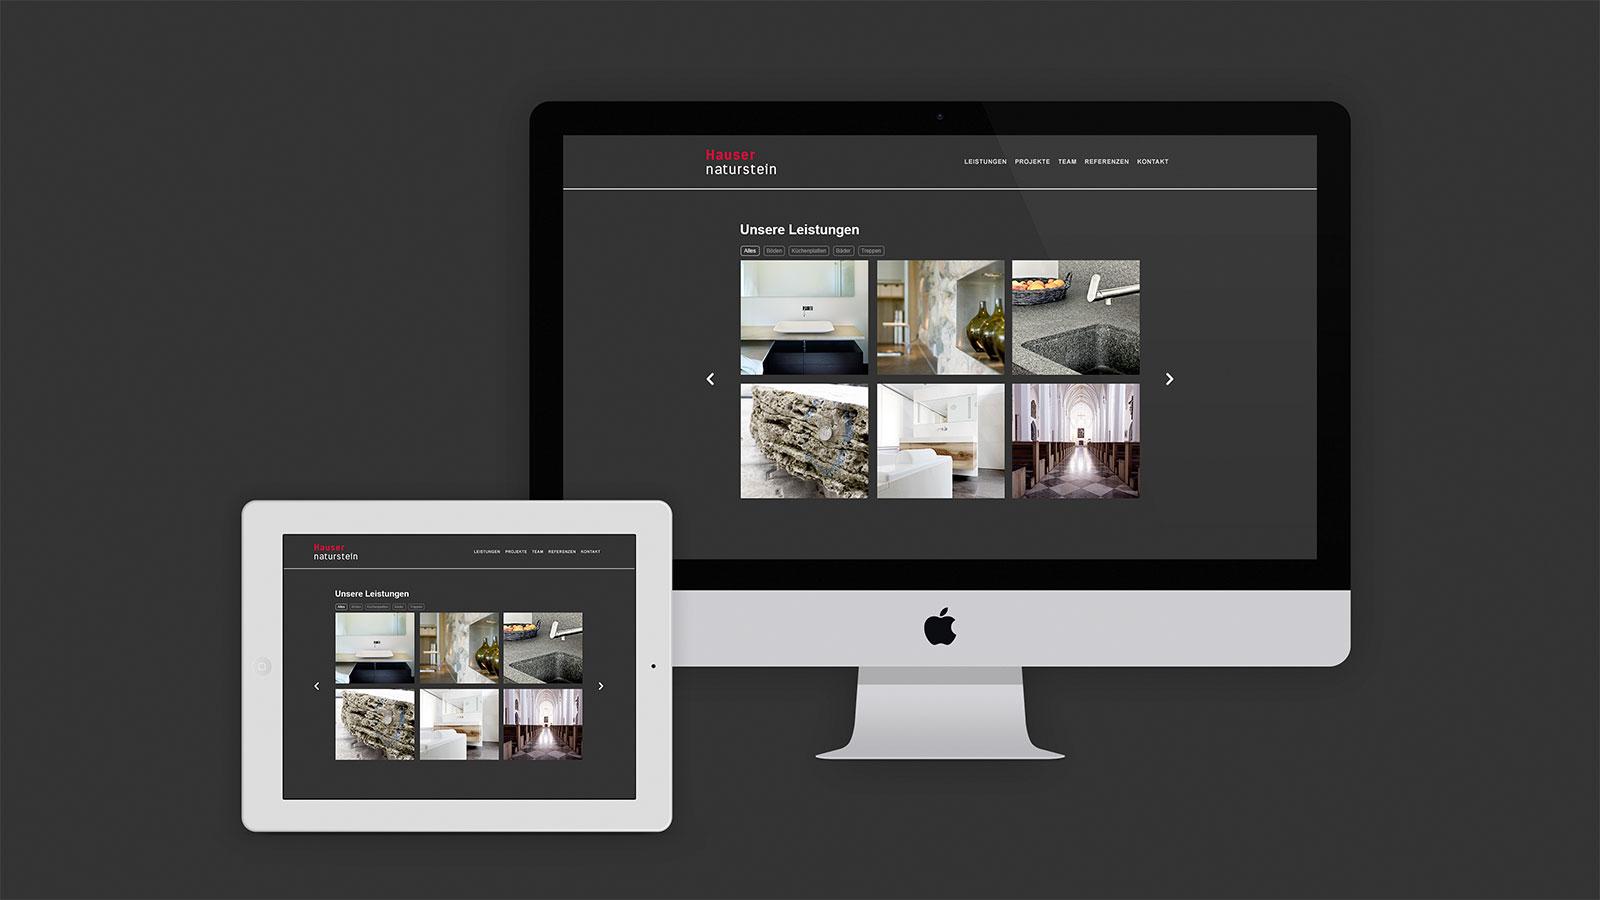 hauser-homepage-4